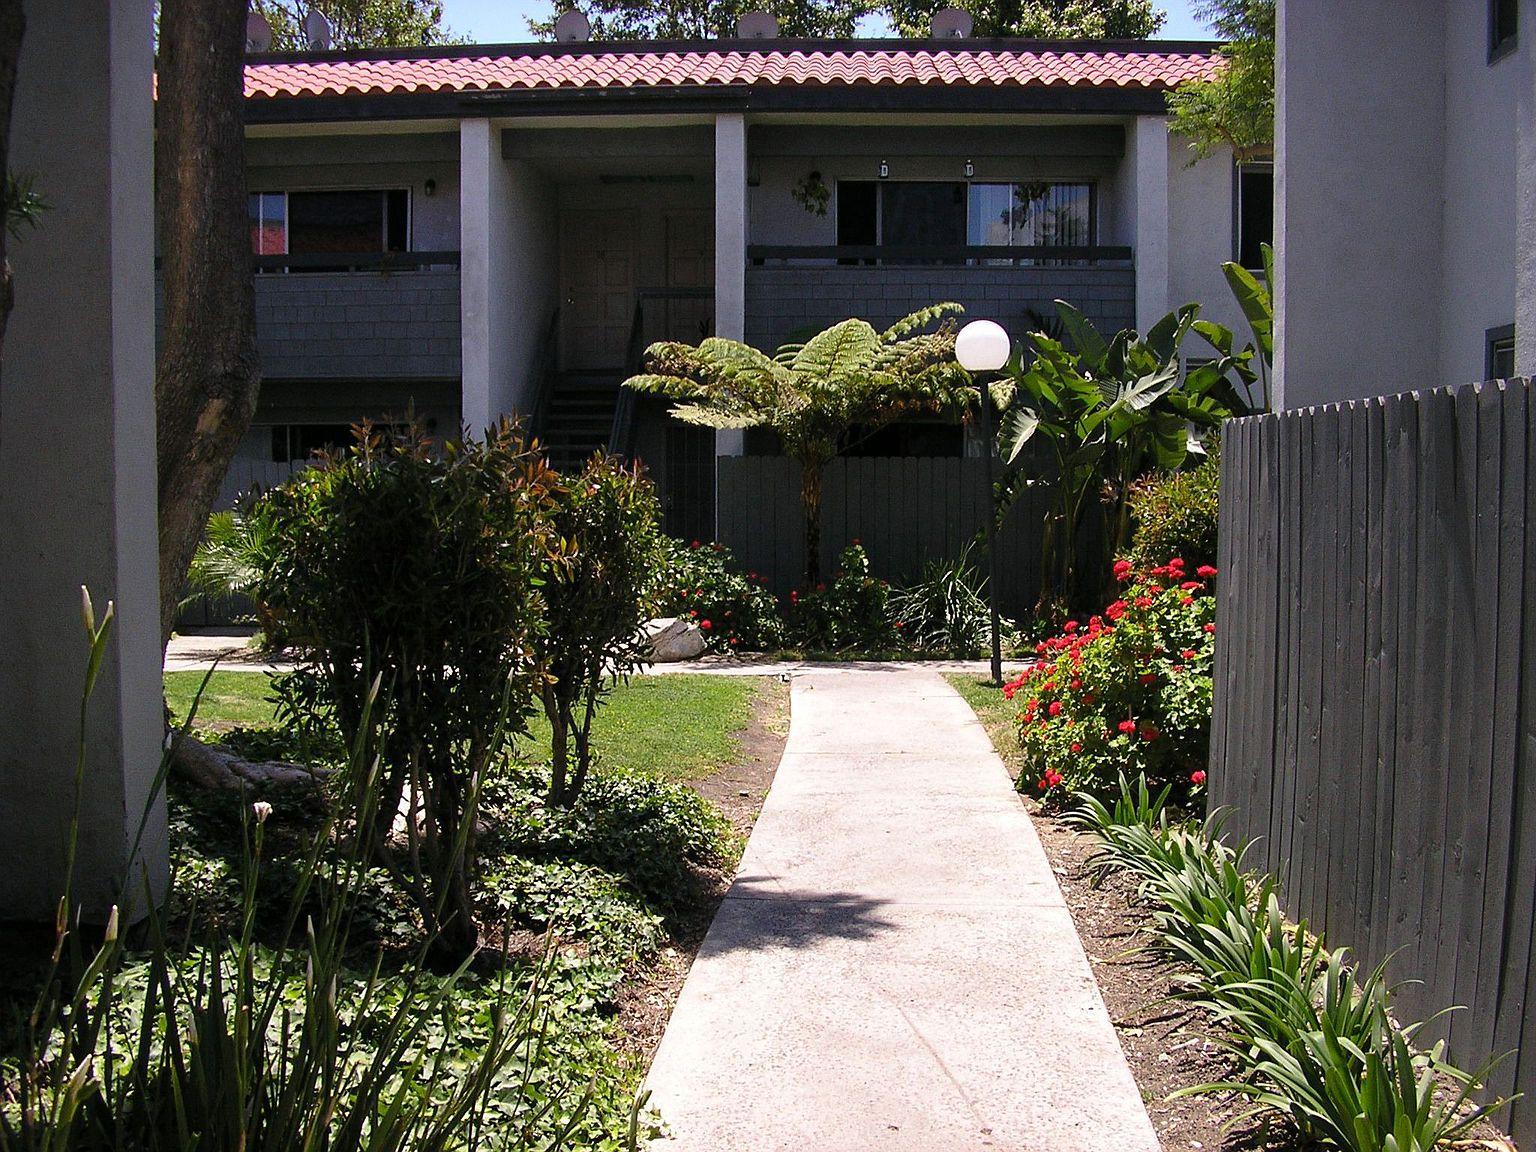 3f95ac8f3b401761c3fdb8ba87c78927 cc ft 1536 - Sunflower Gardens Santa Ana Ca 92704